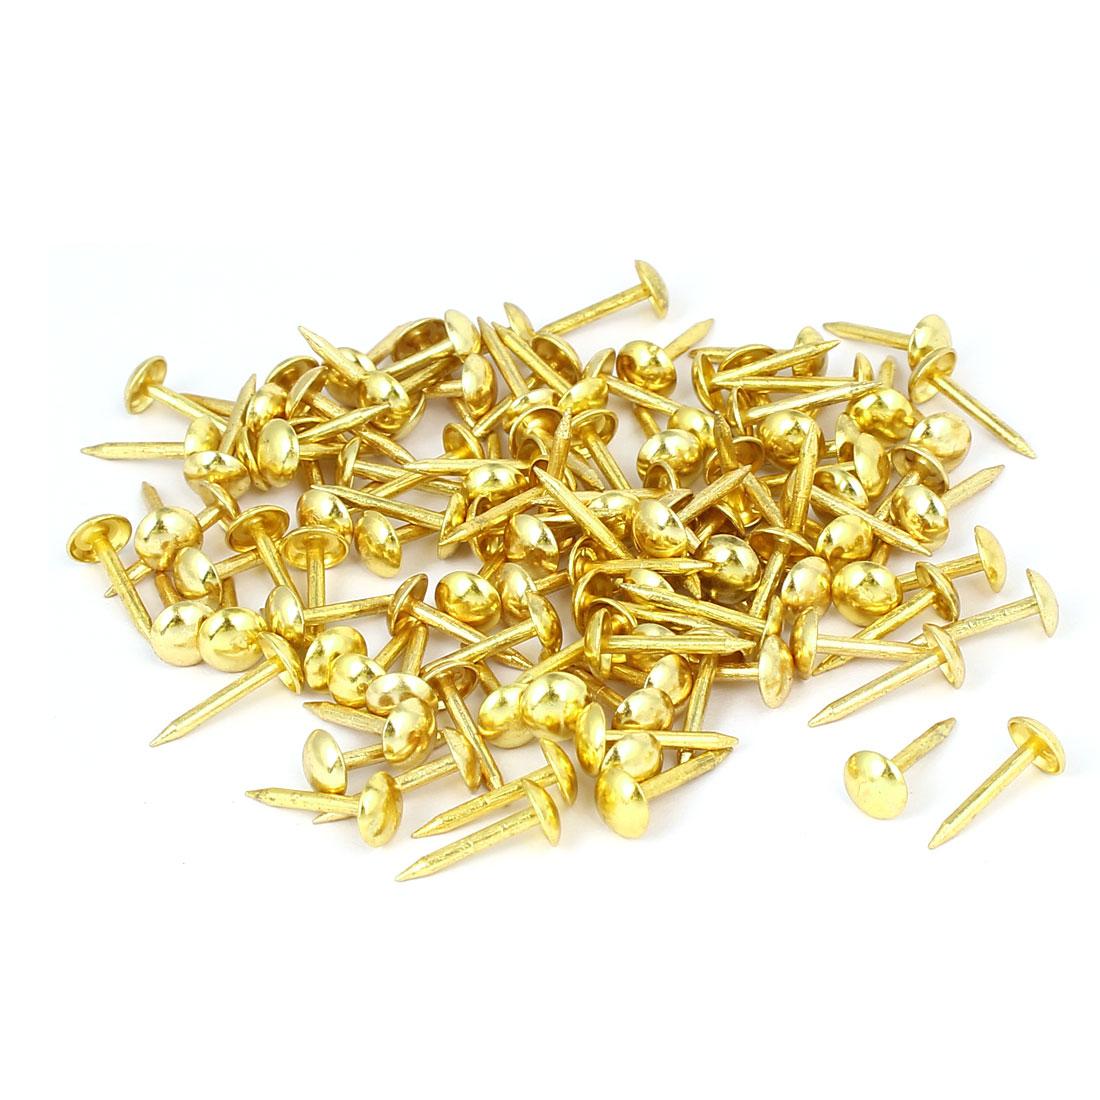 Home Furniture Upholstery Thumb Tack Nail Push Pin Gold Tone 6mm x 14mm 120pcs